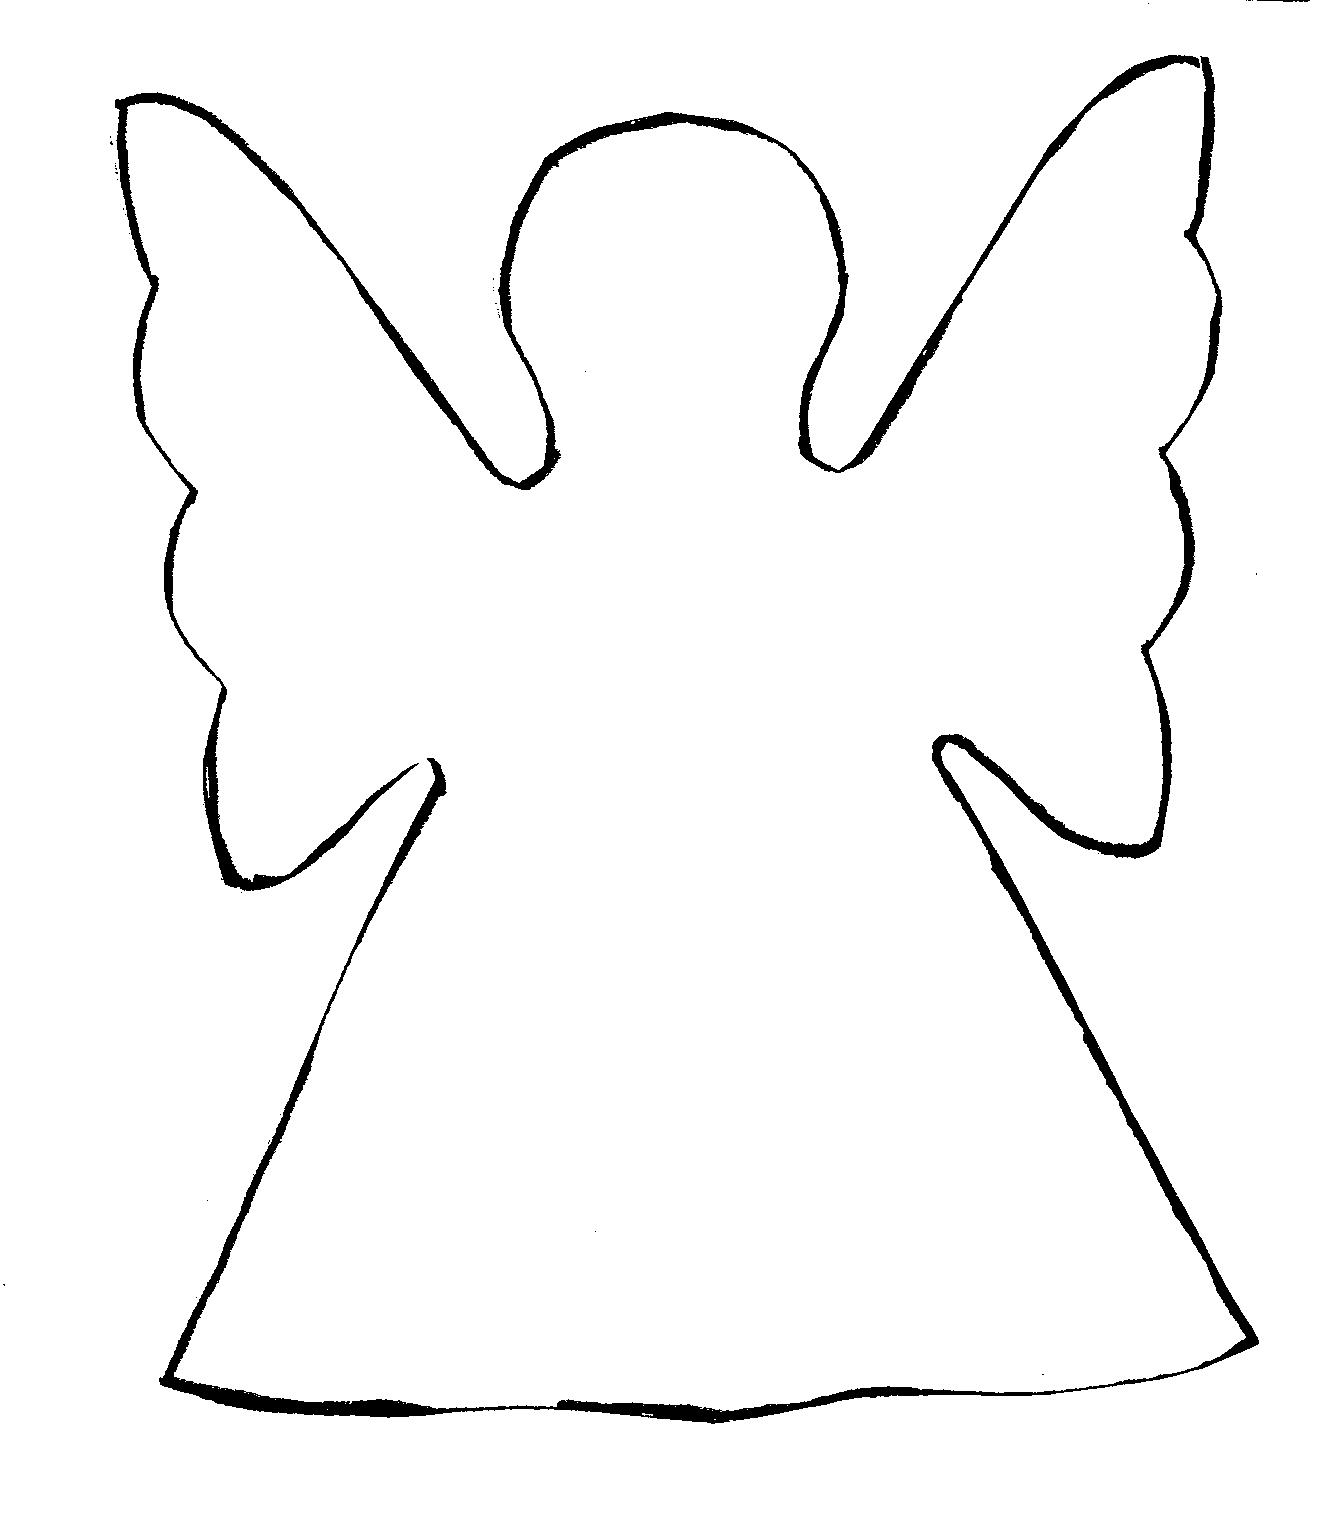 Clip art angel 2-Clip art angel 2-11